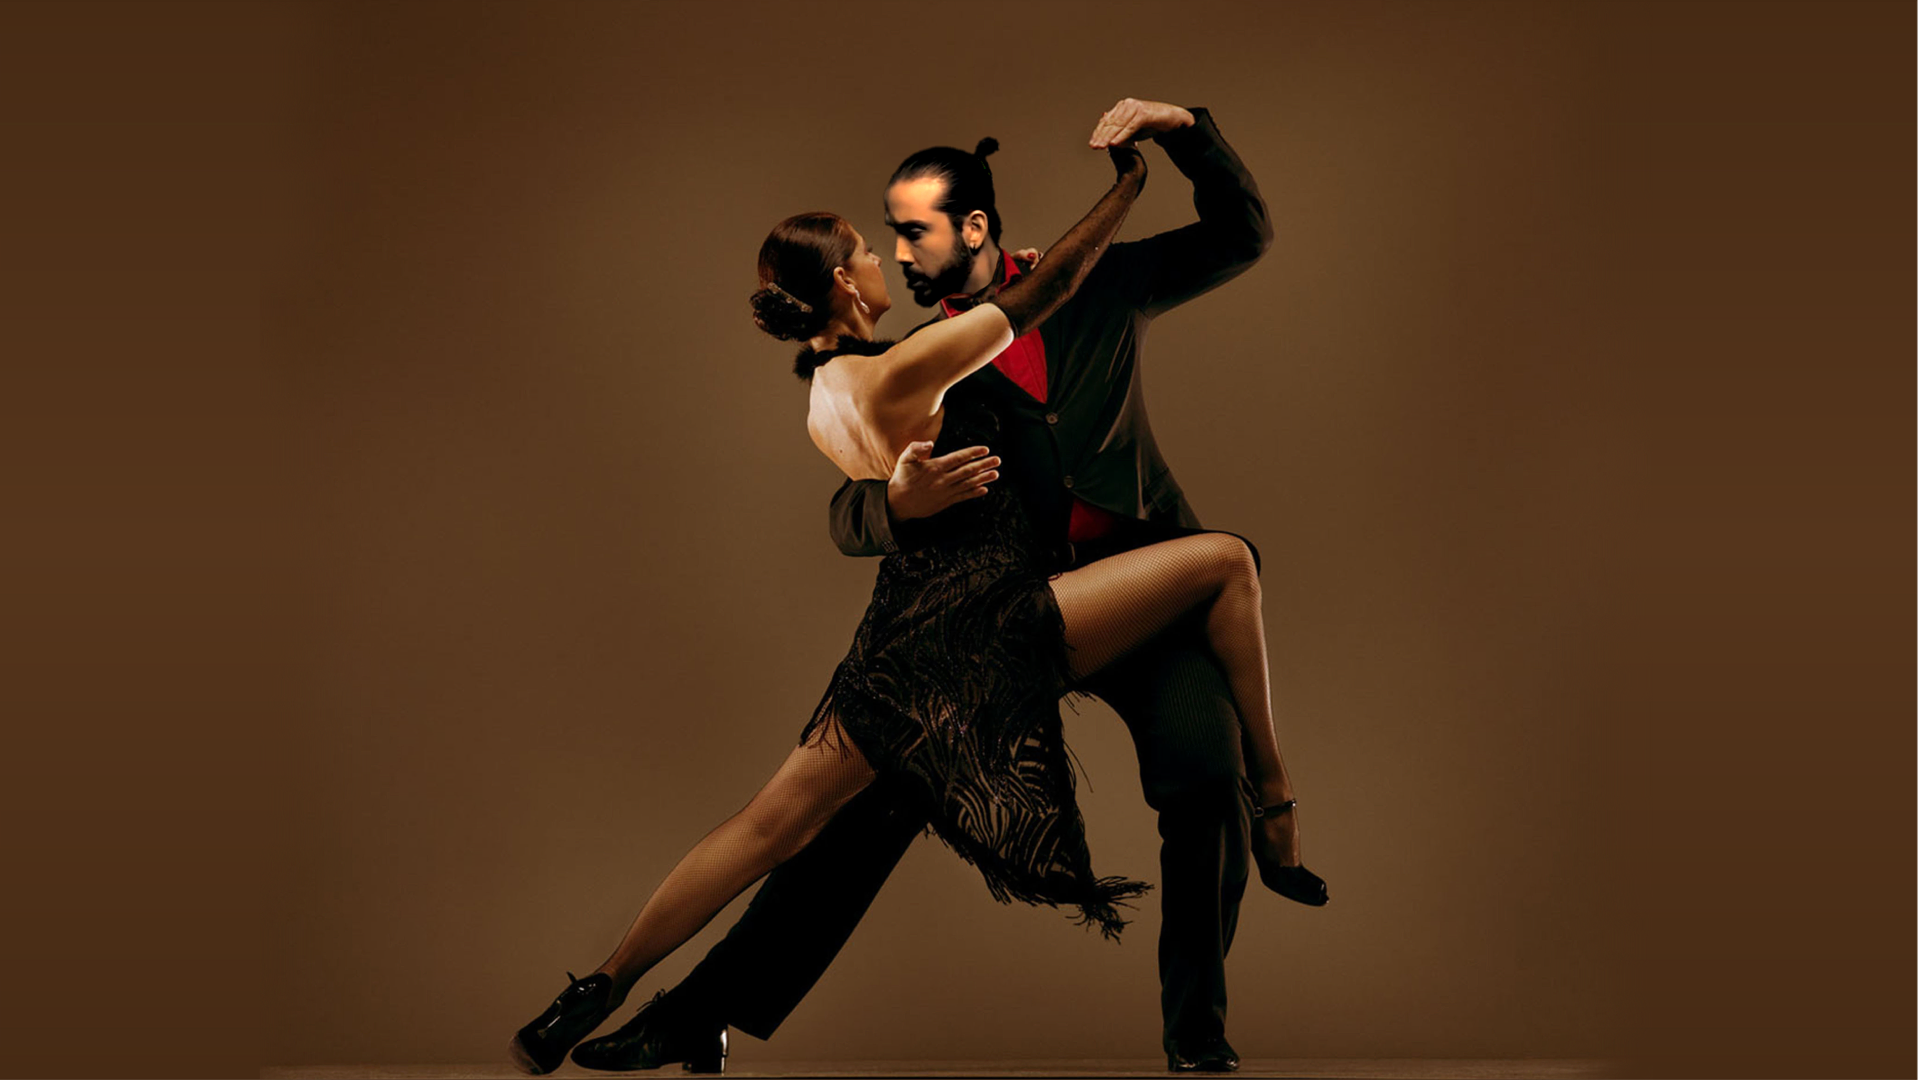 Ballroom Dancing PNG HD - 139624